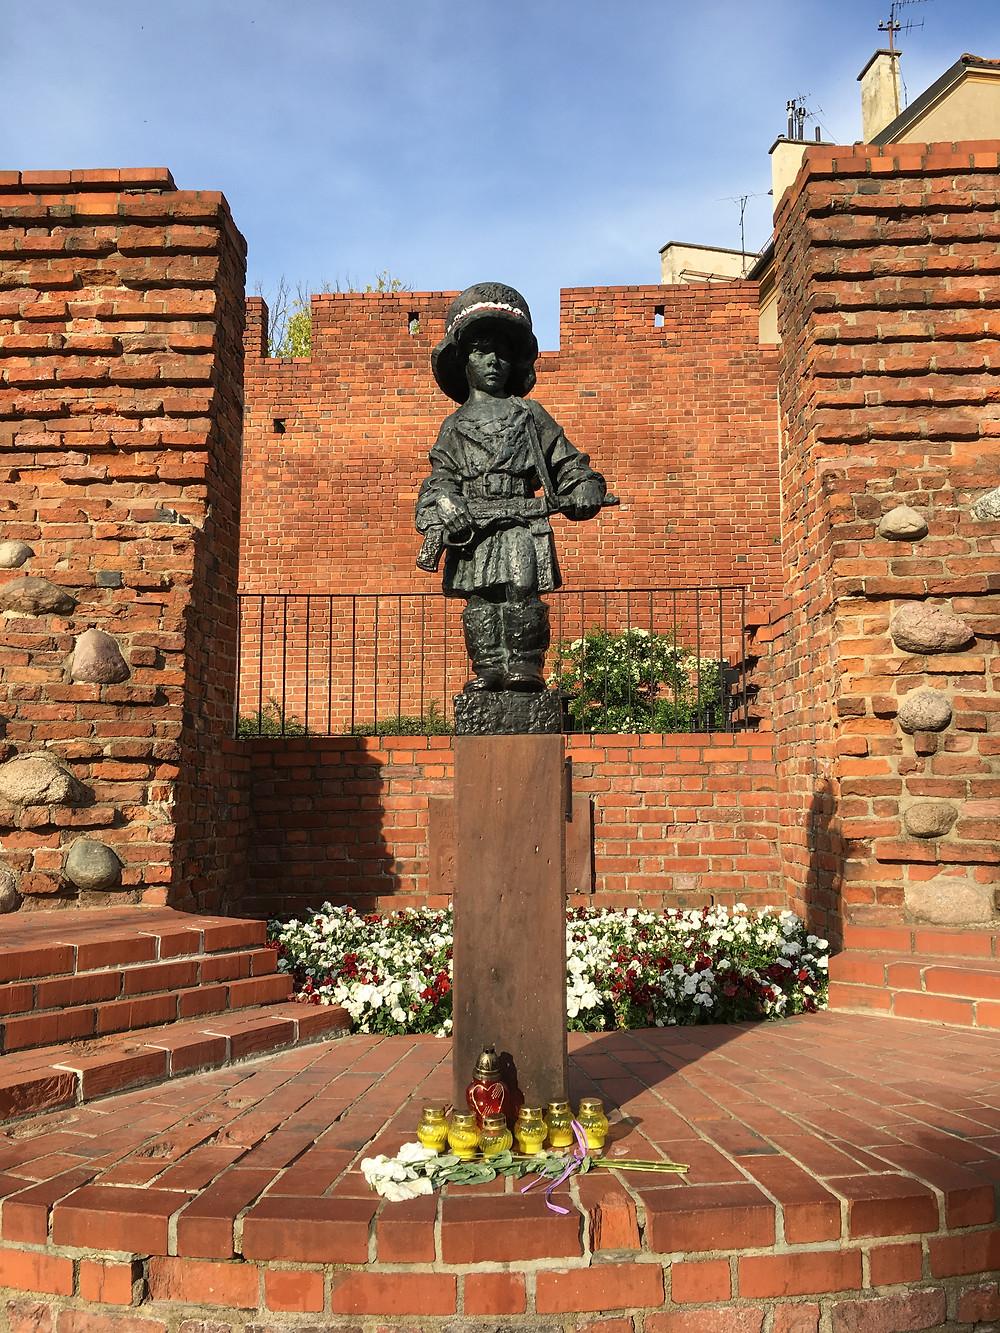 The Little Insurgent Monument